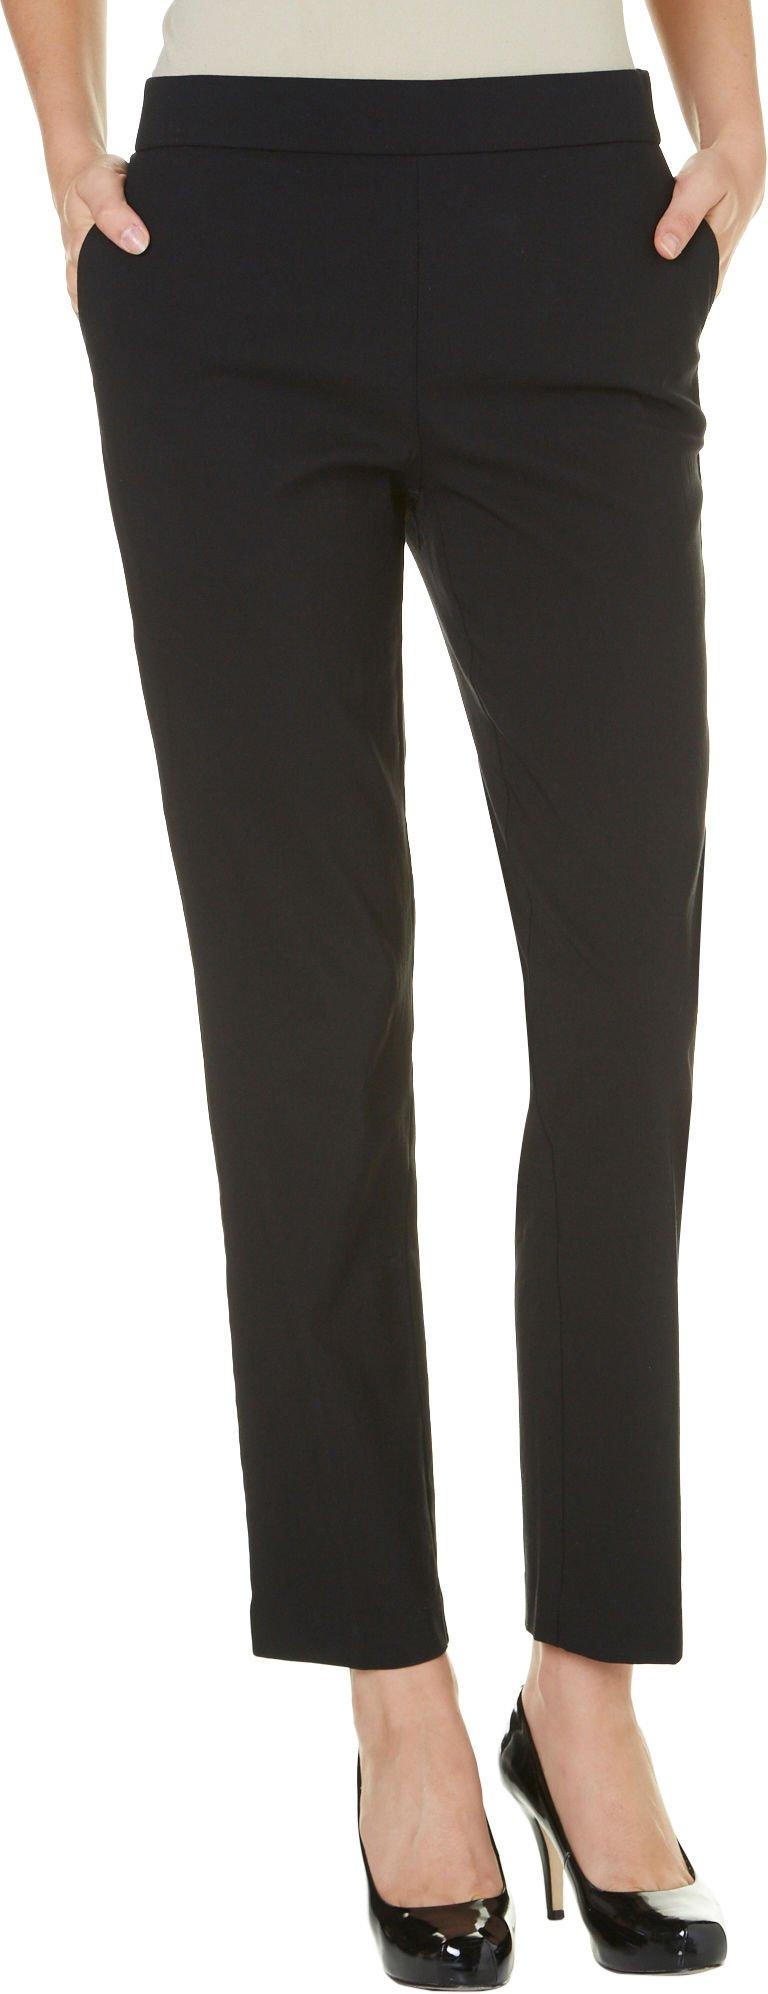 Counterparts Womens Tummy Control Slim Leg Pants 14 Black